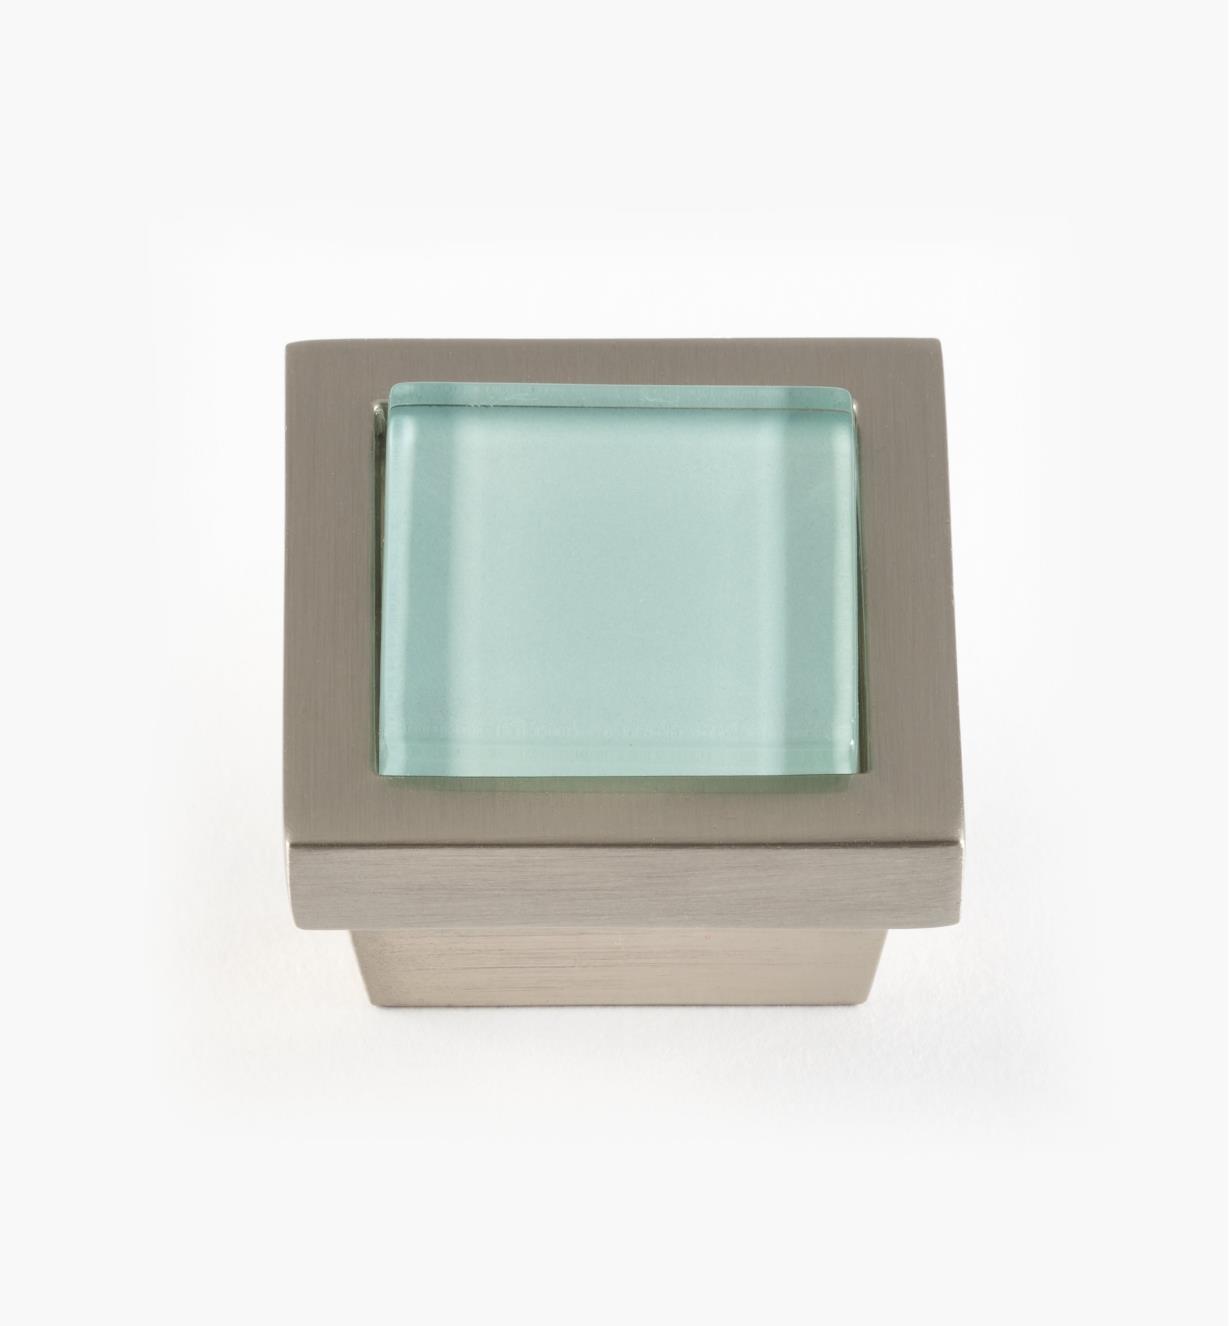 01W5132 - Bouton carré Spa, turquoise, fini nickel brossé, 1 3/8 po